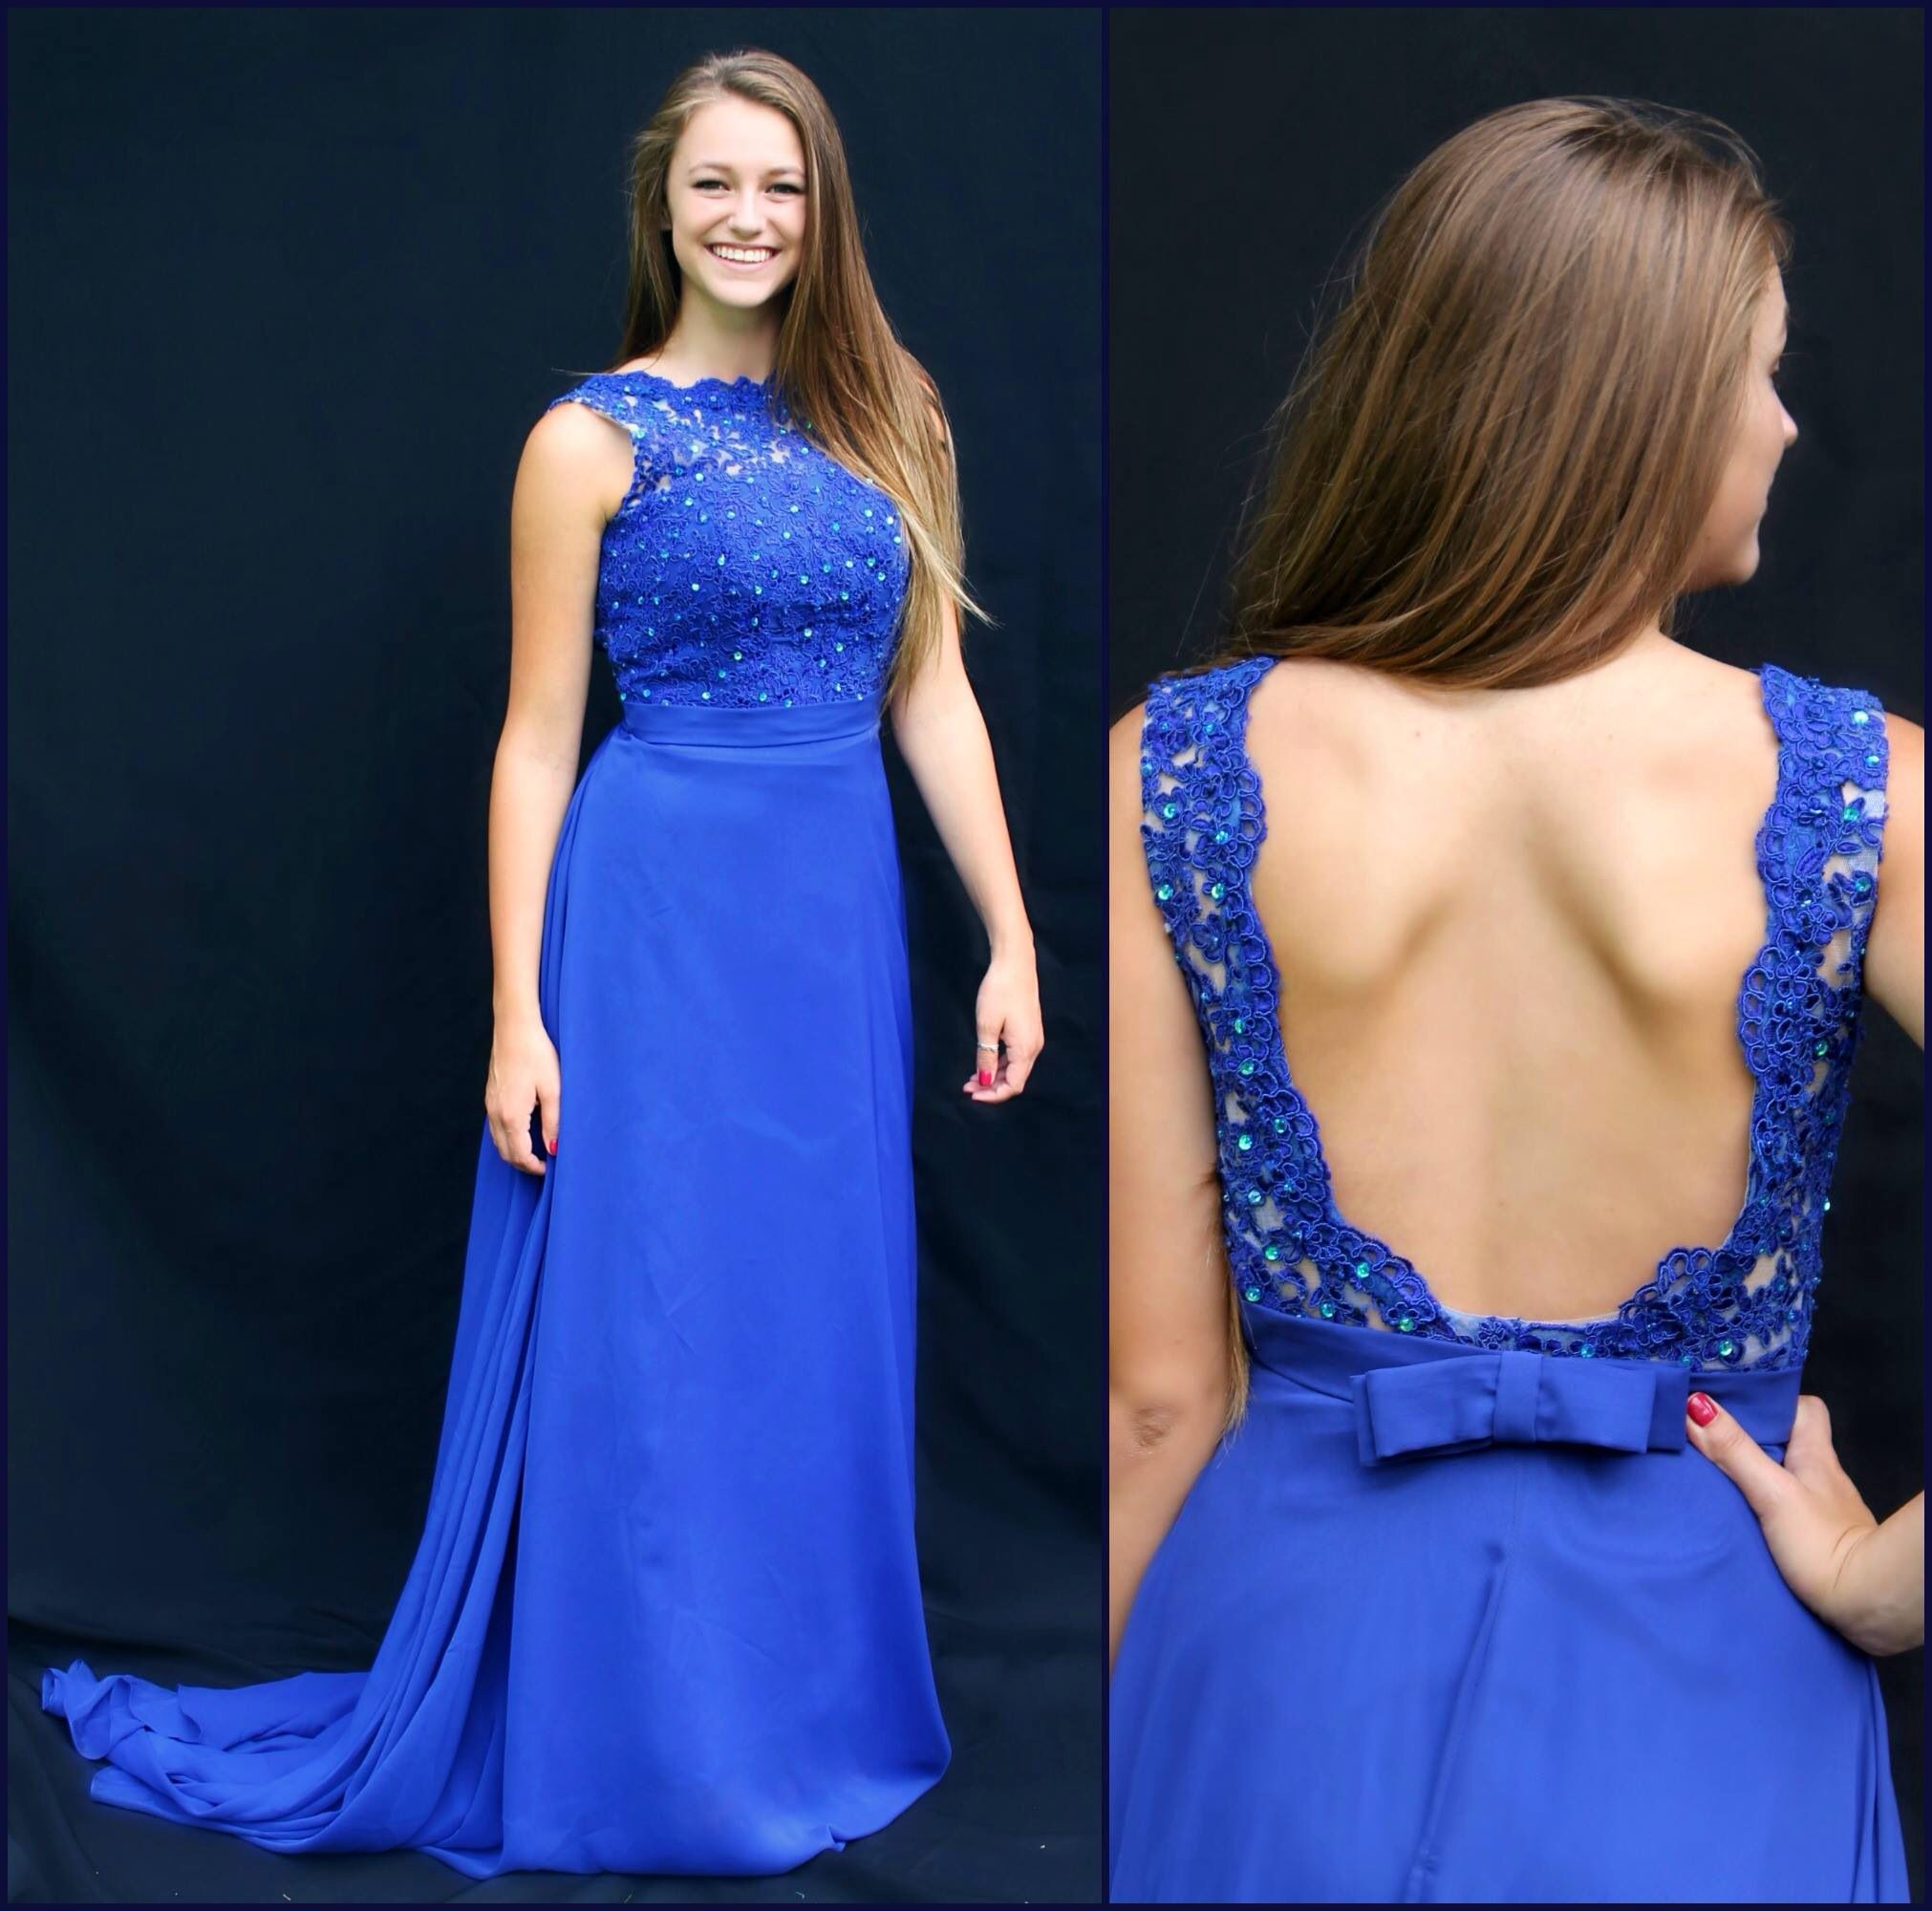 Long royal blue high neck formal dress. All dresses available at Bling It On Dress Rentals in Riverton, Utah! Find us on insta and fb! @blingitondressrentals